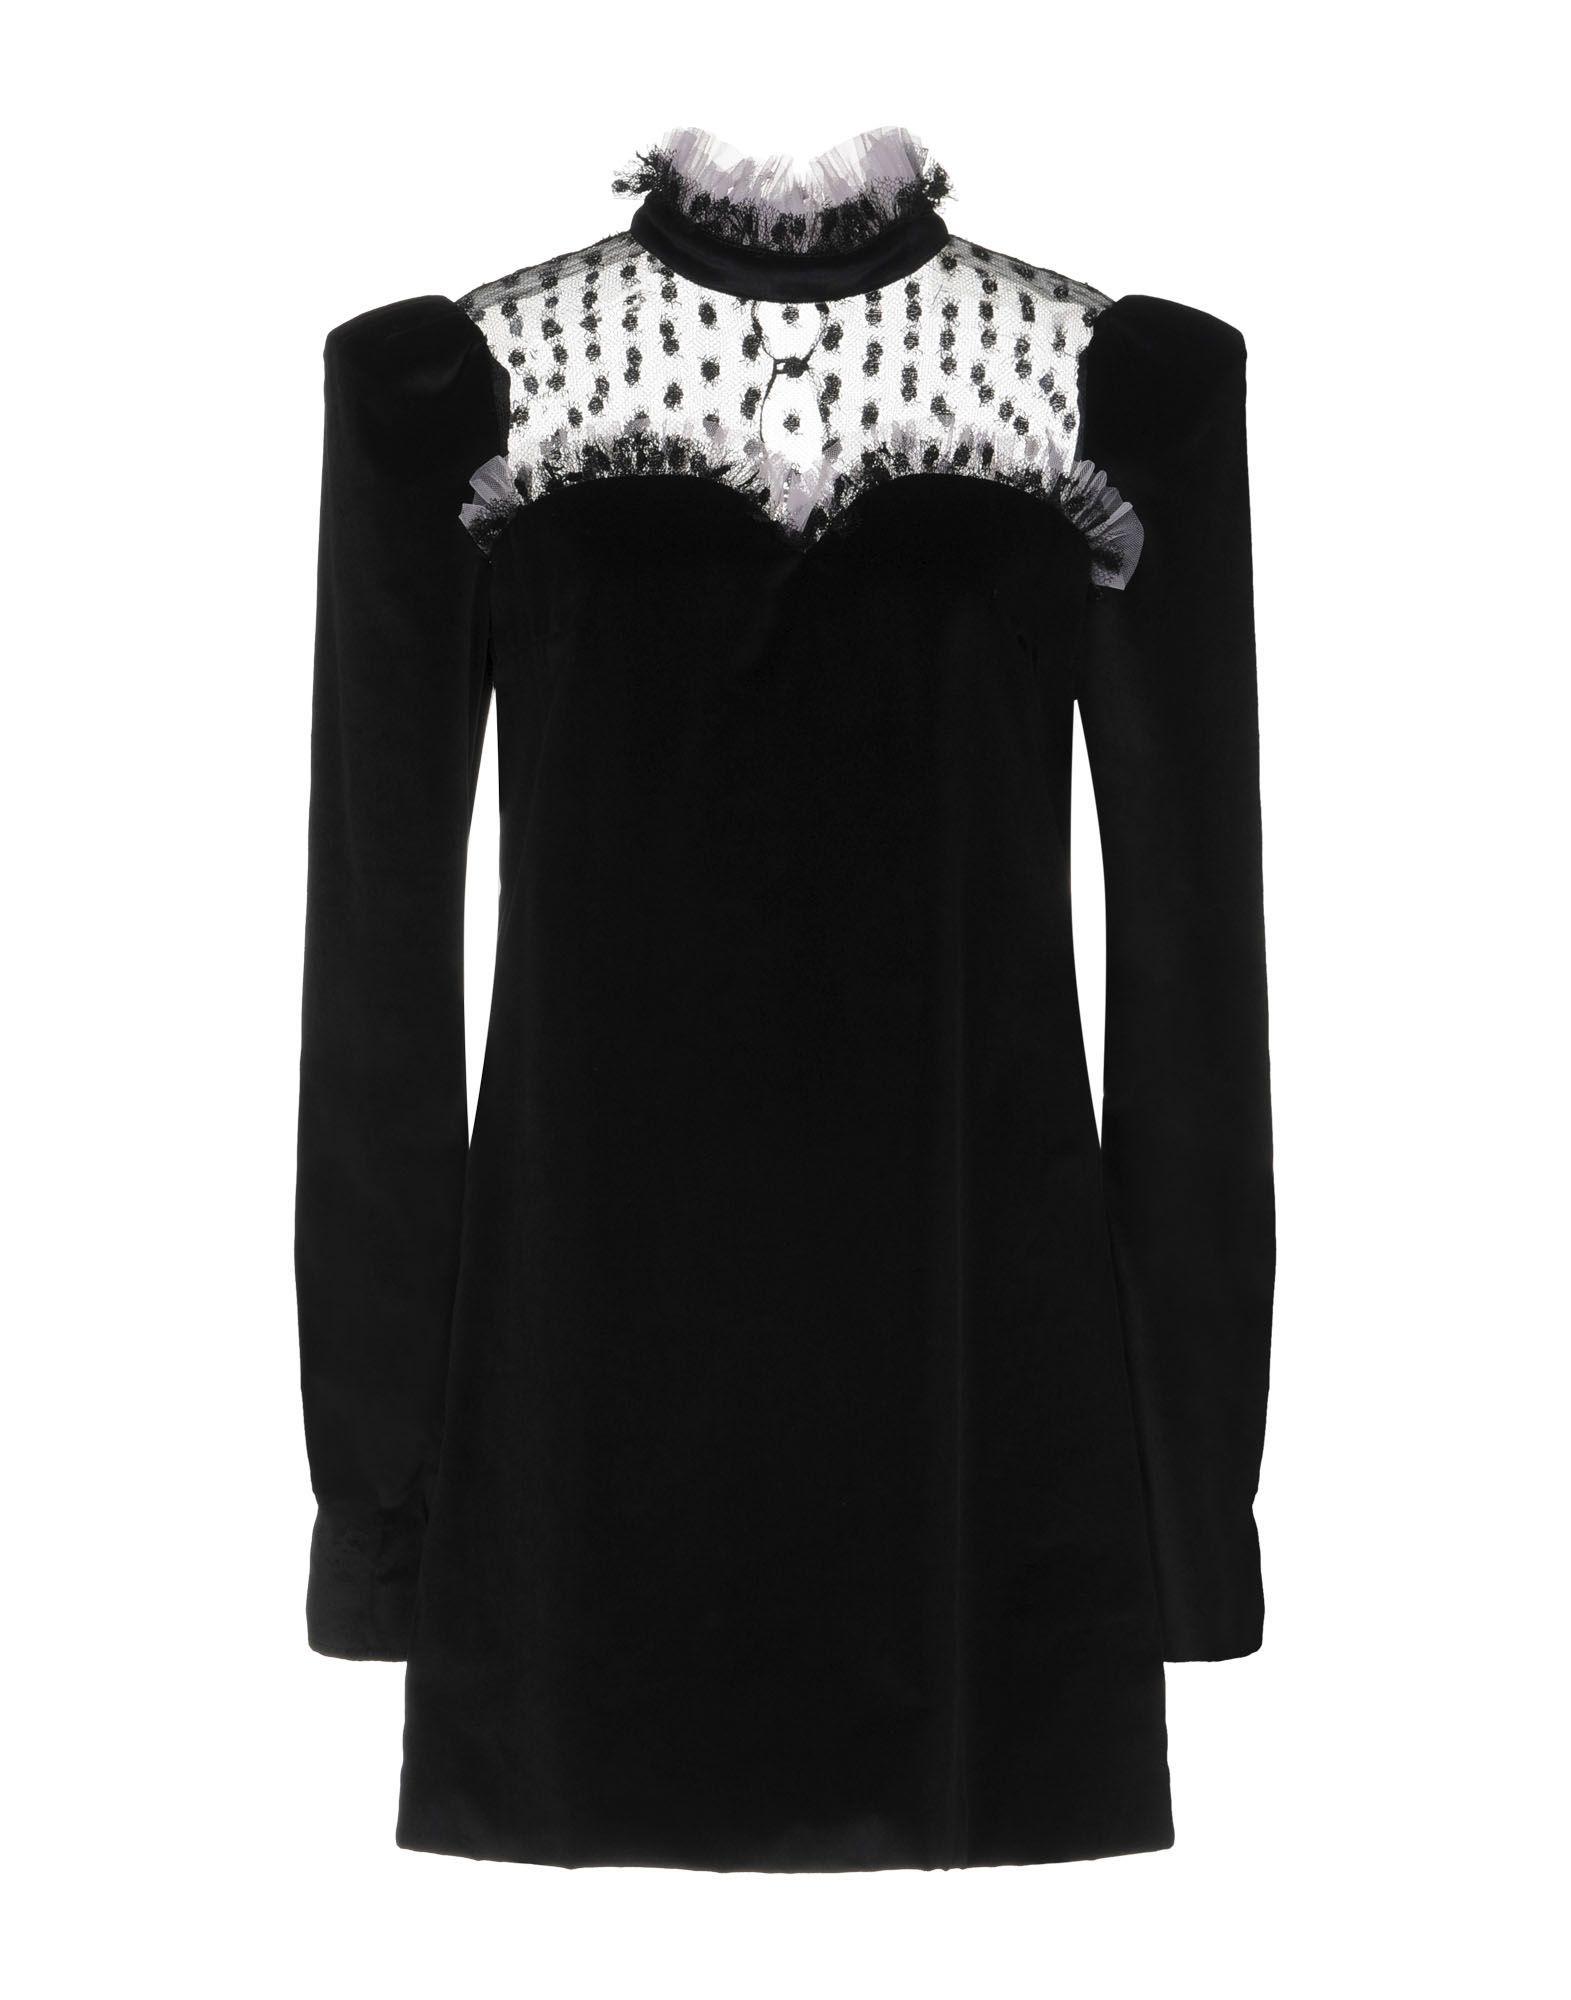 DANIELE CARLOTTA Short Dress in Black